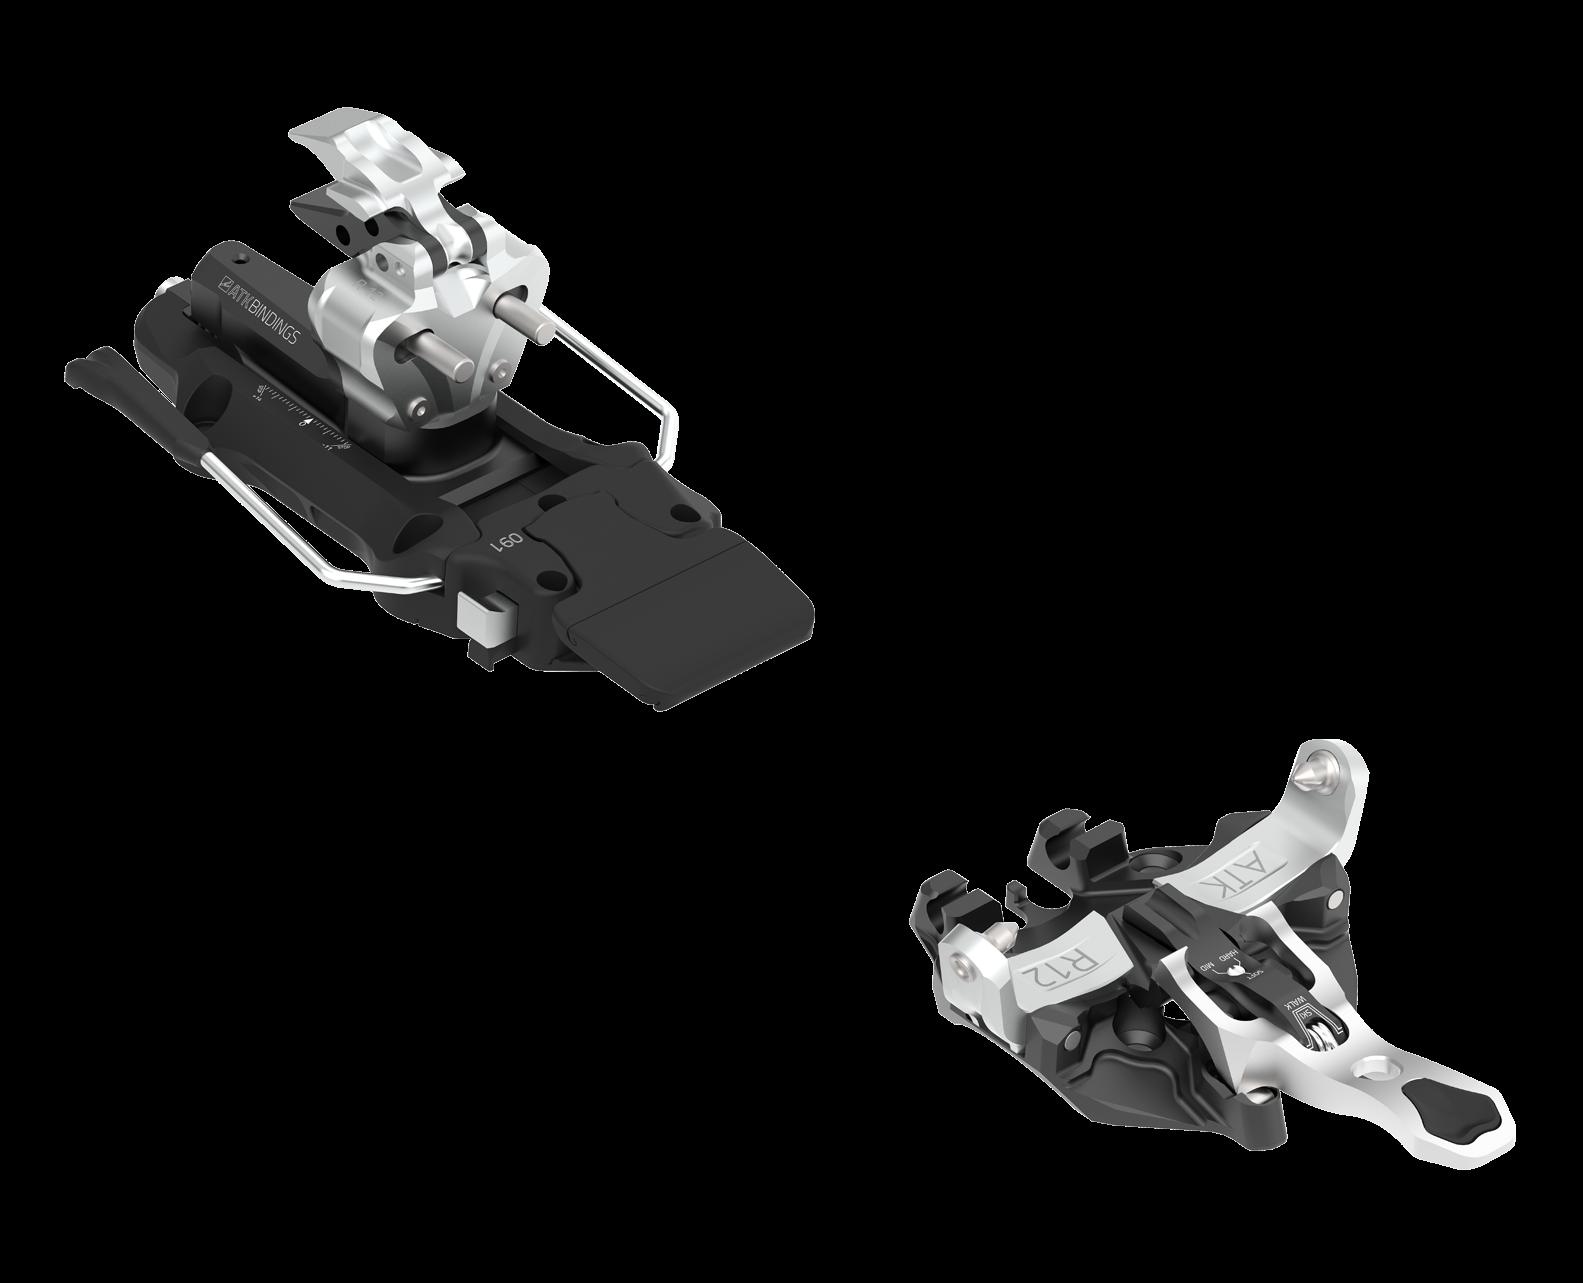 ATK Raider 12 <del>€ 555,00</del>